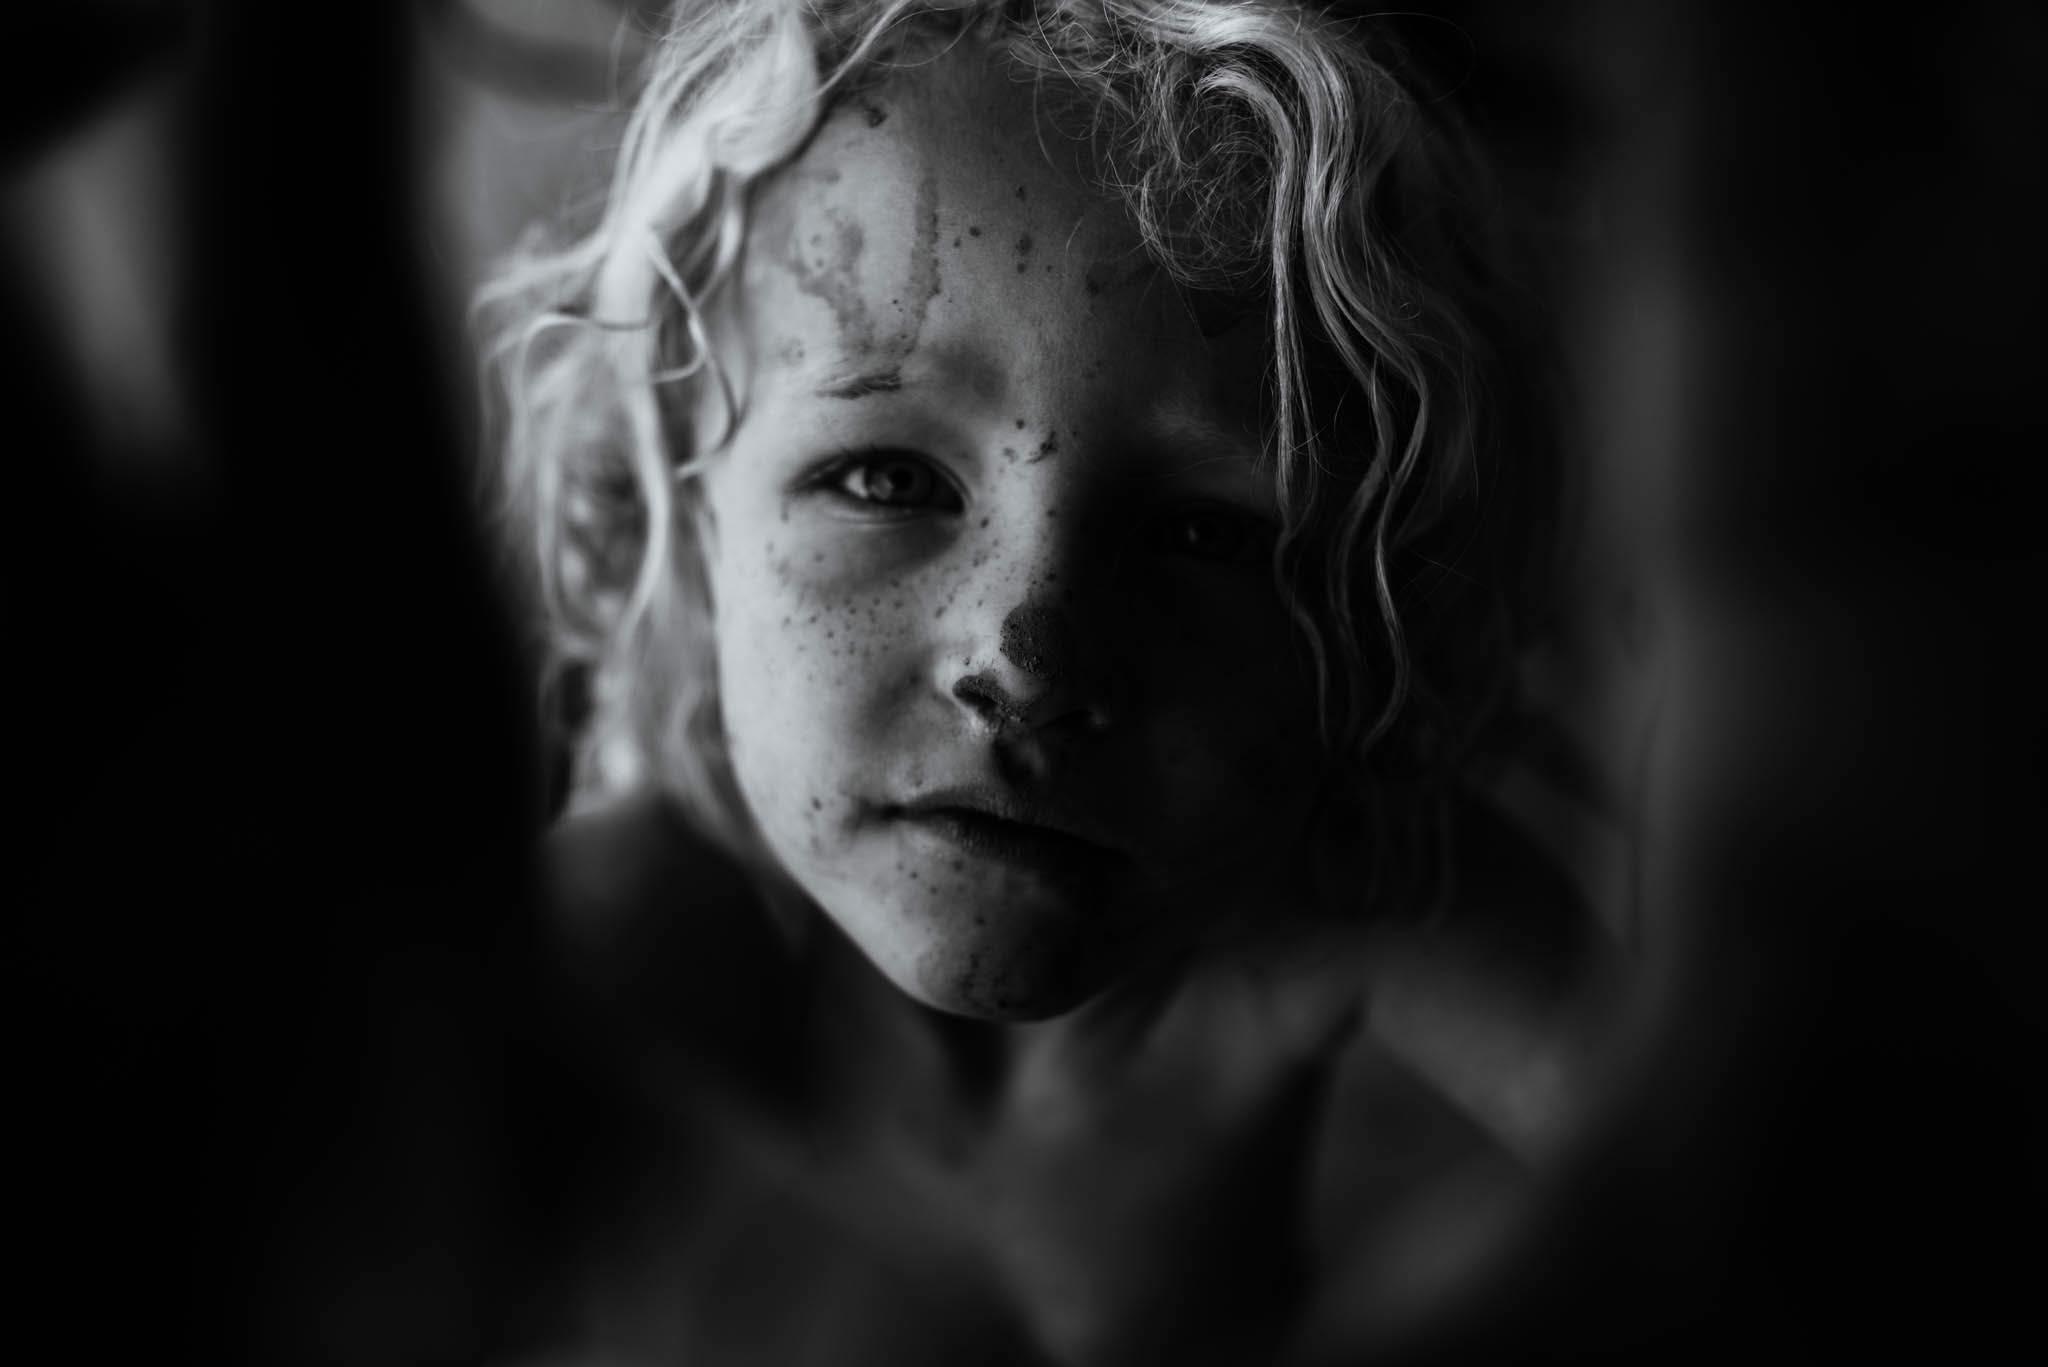 By Nicolette Dudeck